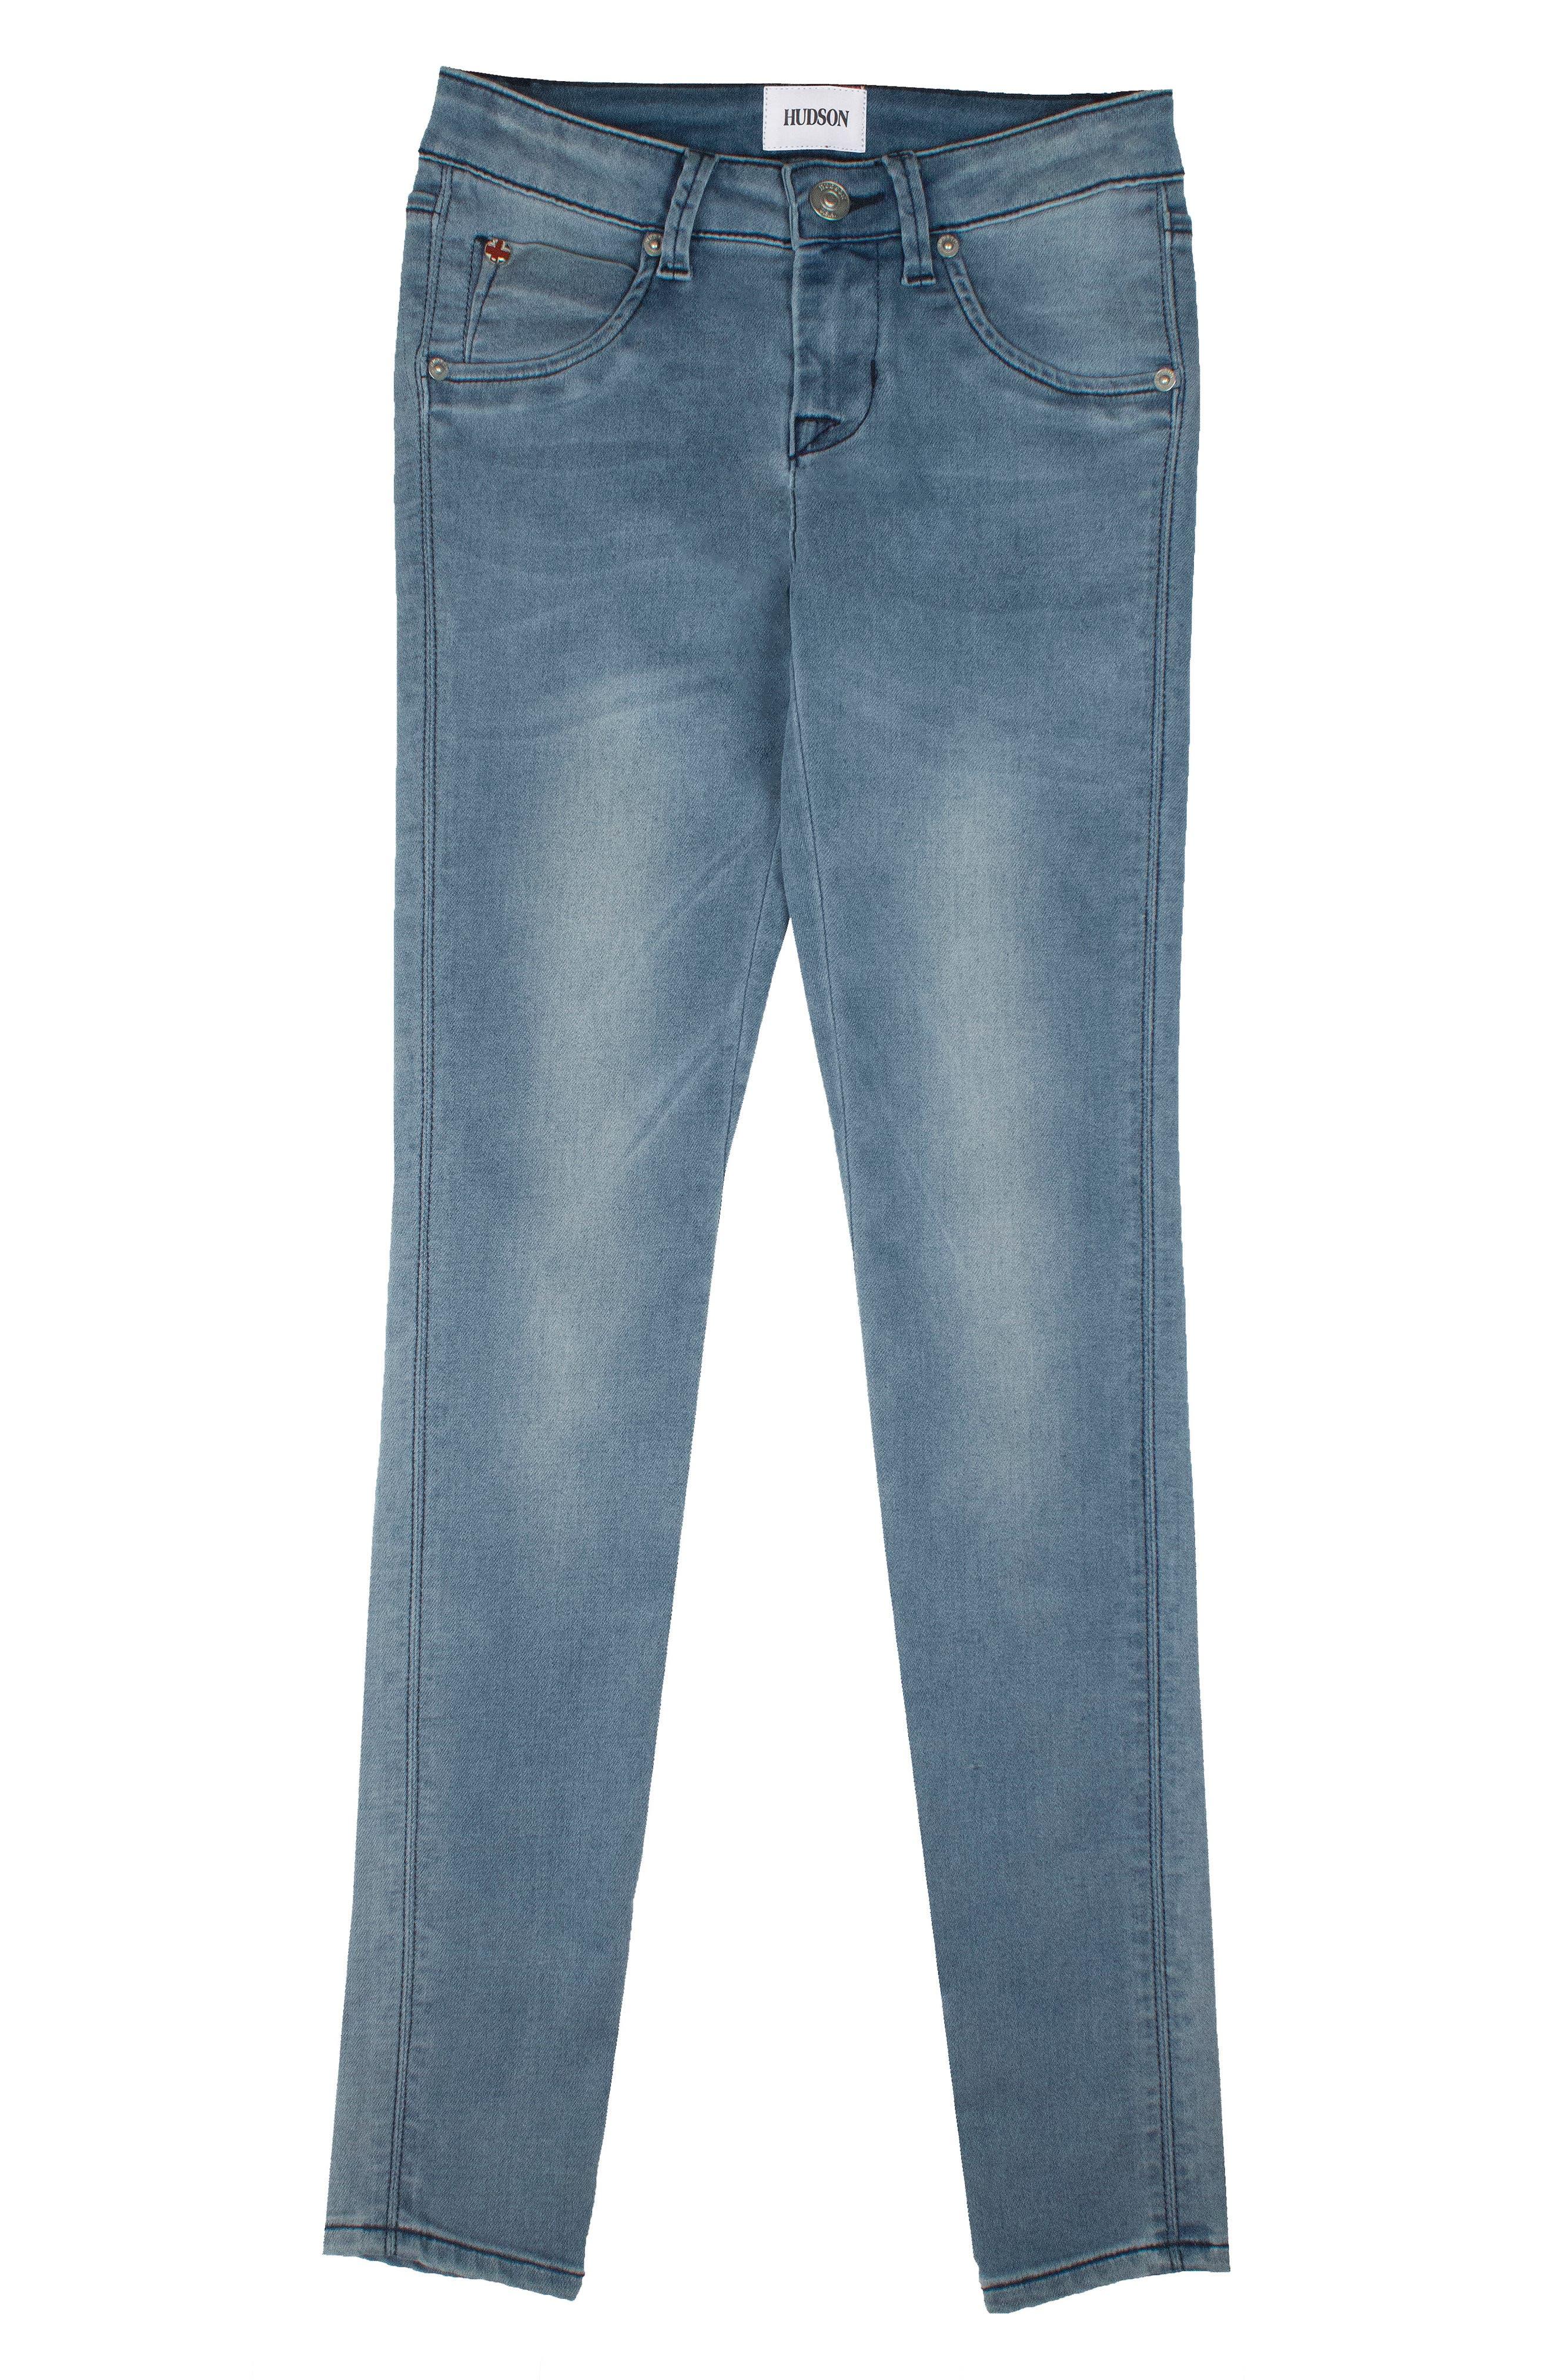 Main Image - Hudson Kids Collin Flap Pocket Skinny Jeans (Toddler Girls & Little Girls)